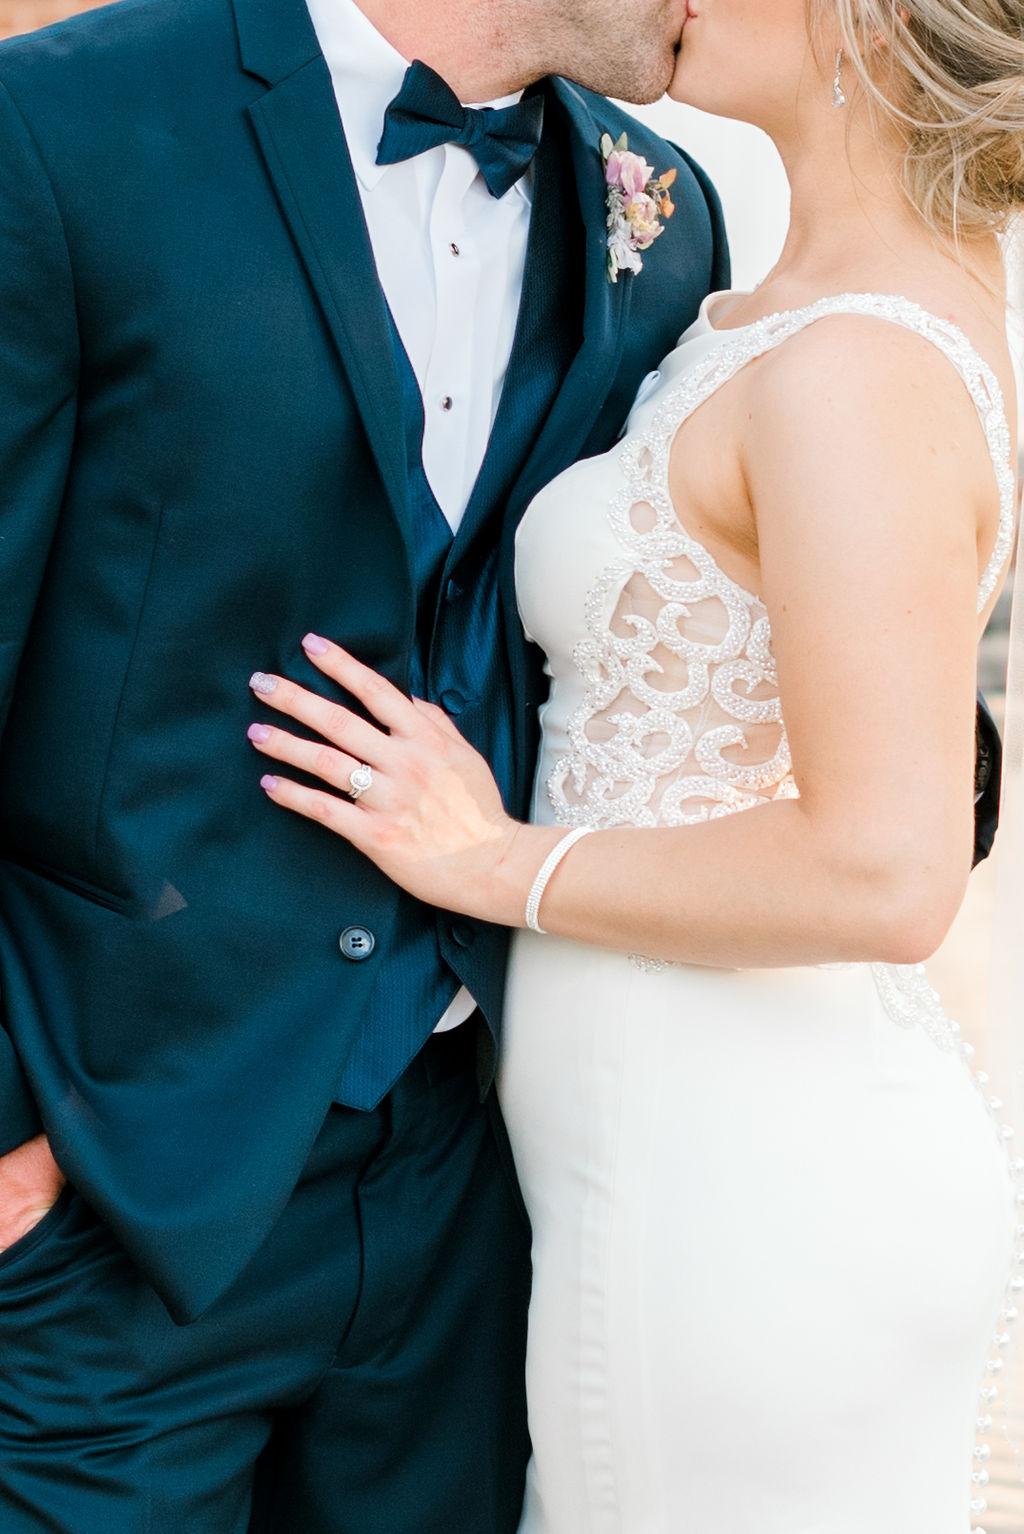 Dayton-event-planer-bride-and-groom-dress-and-tux-wedding-ohio.jpg